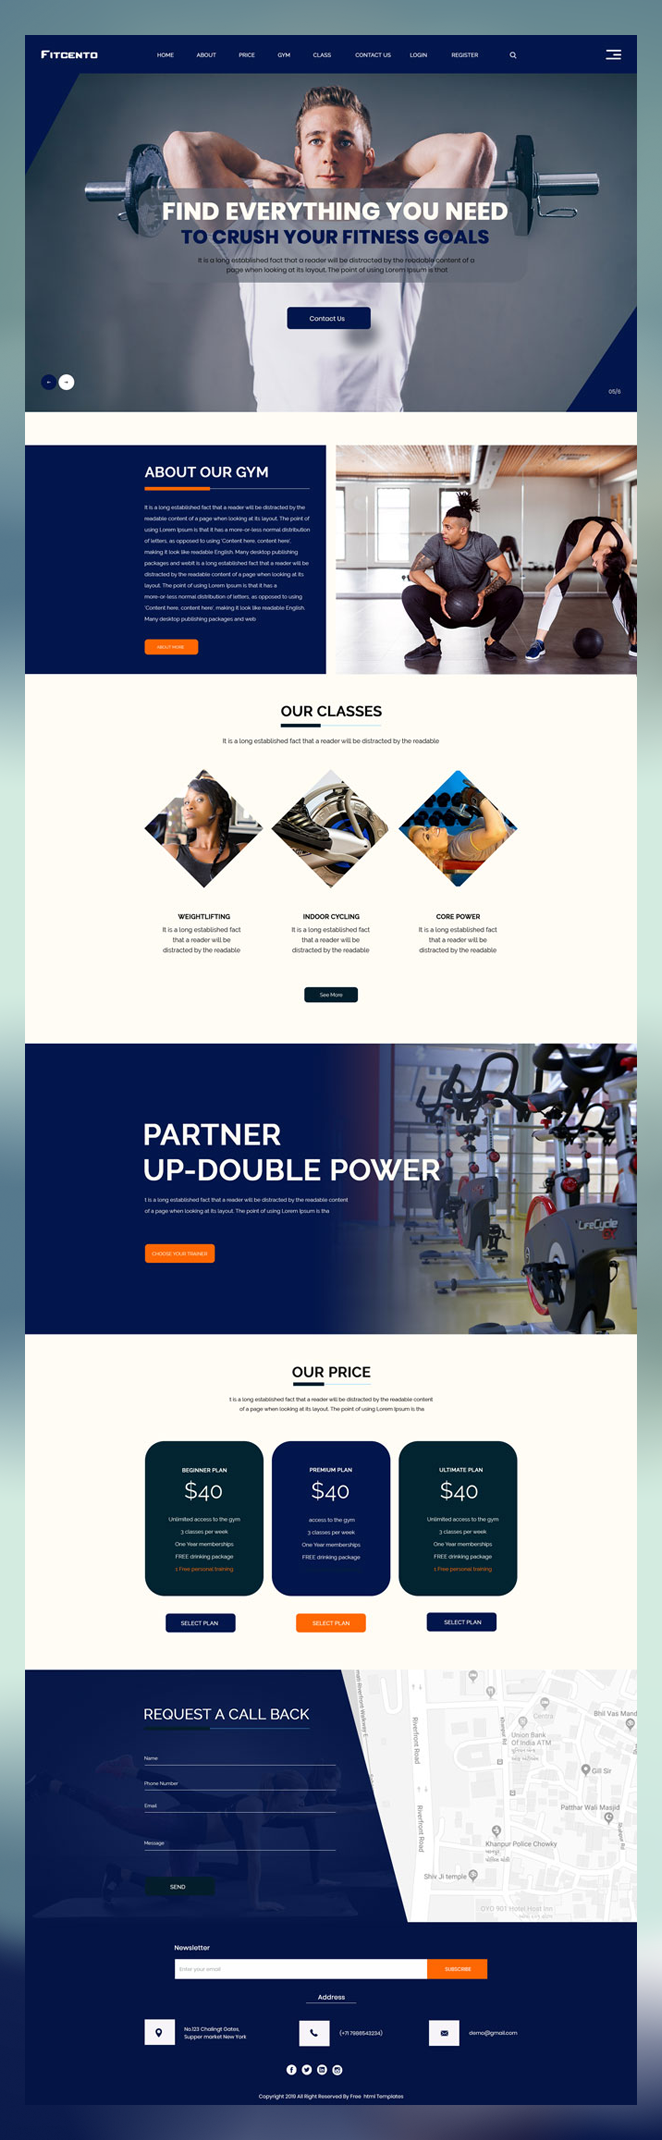 Fitness gym website psd template